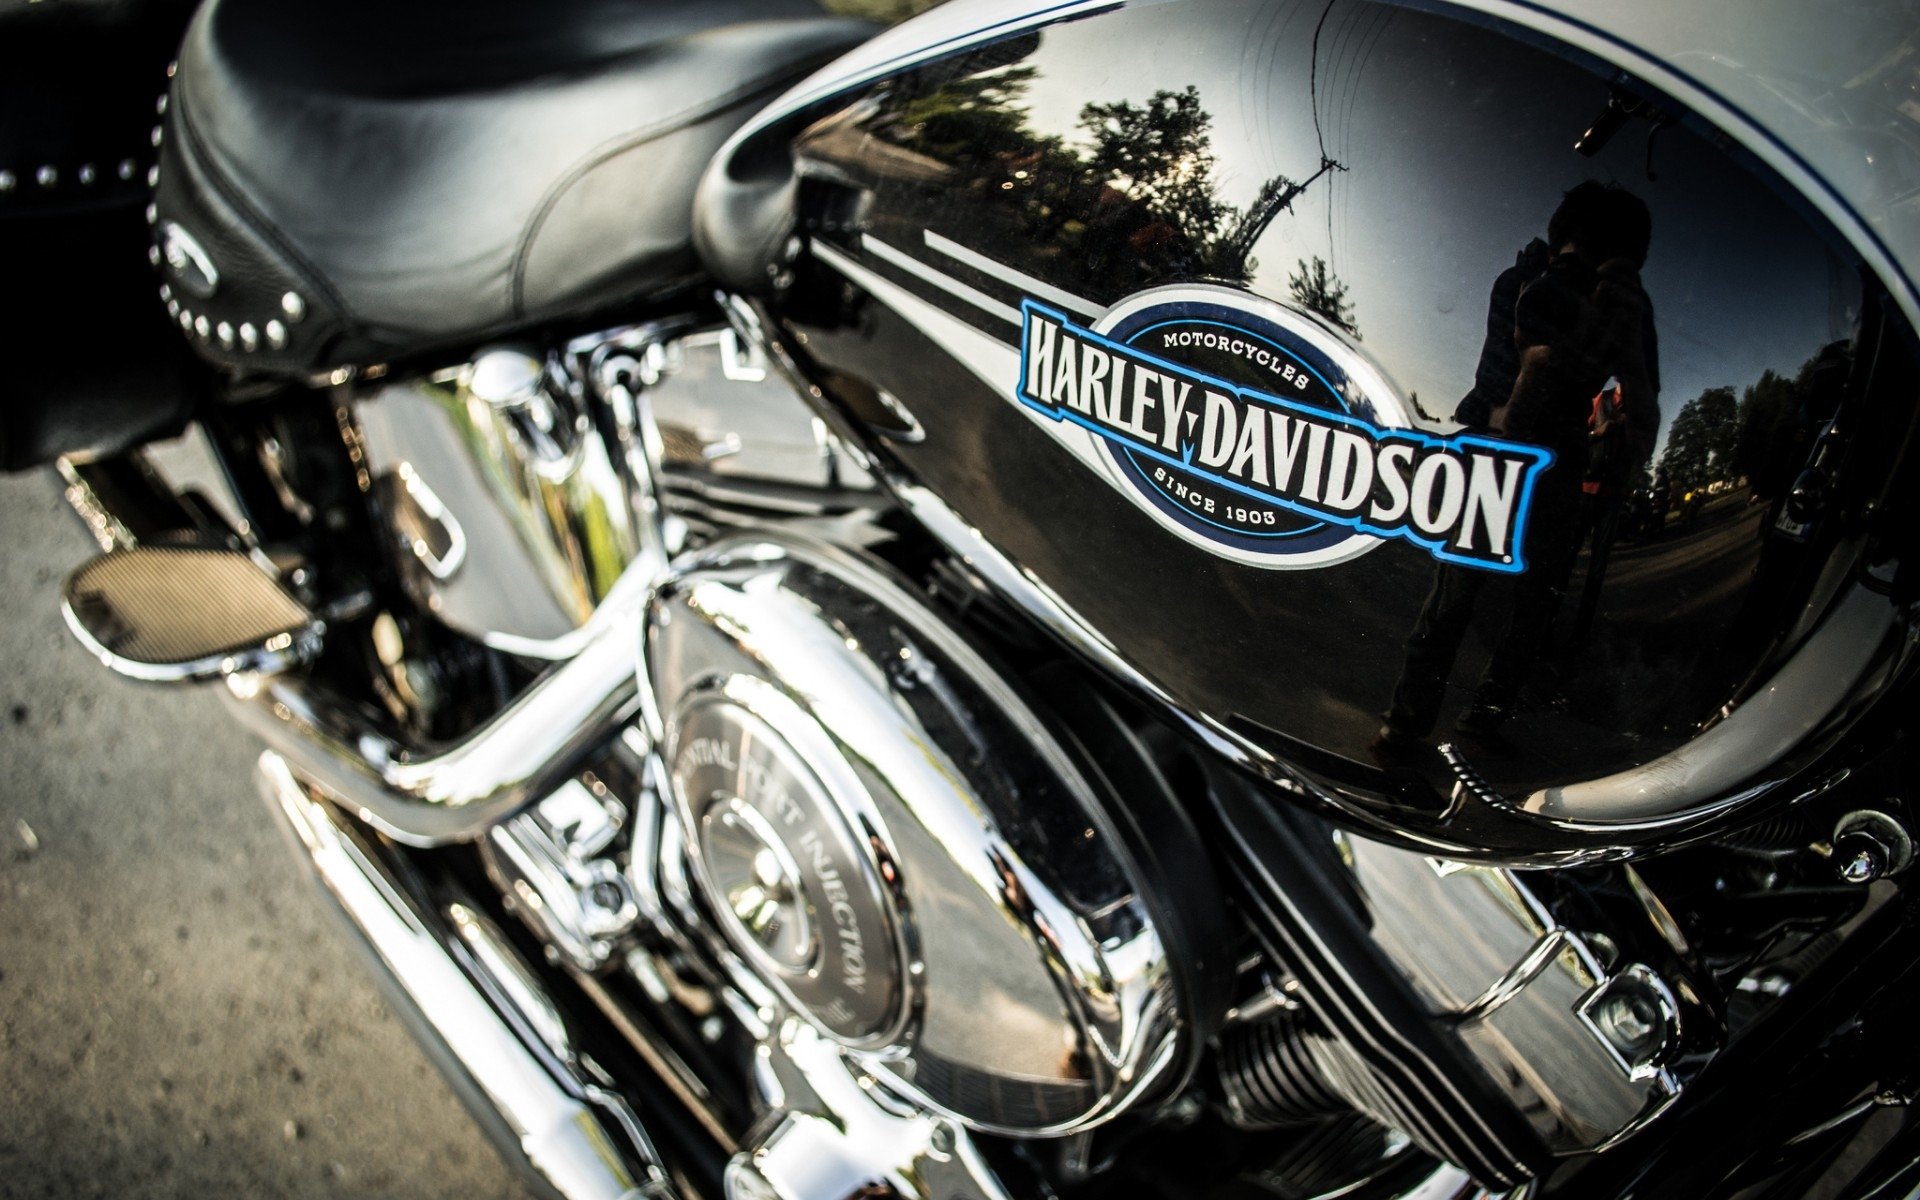 Harley davidson wallpaper for ipad wallpapersafari wallpaper hd harley davidson logo hd wallpaper expert 1920x1200 voltagebd Images